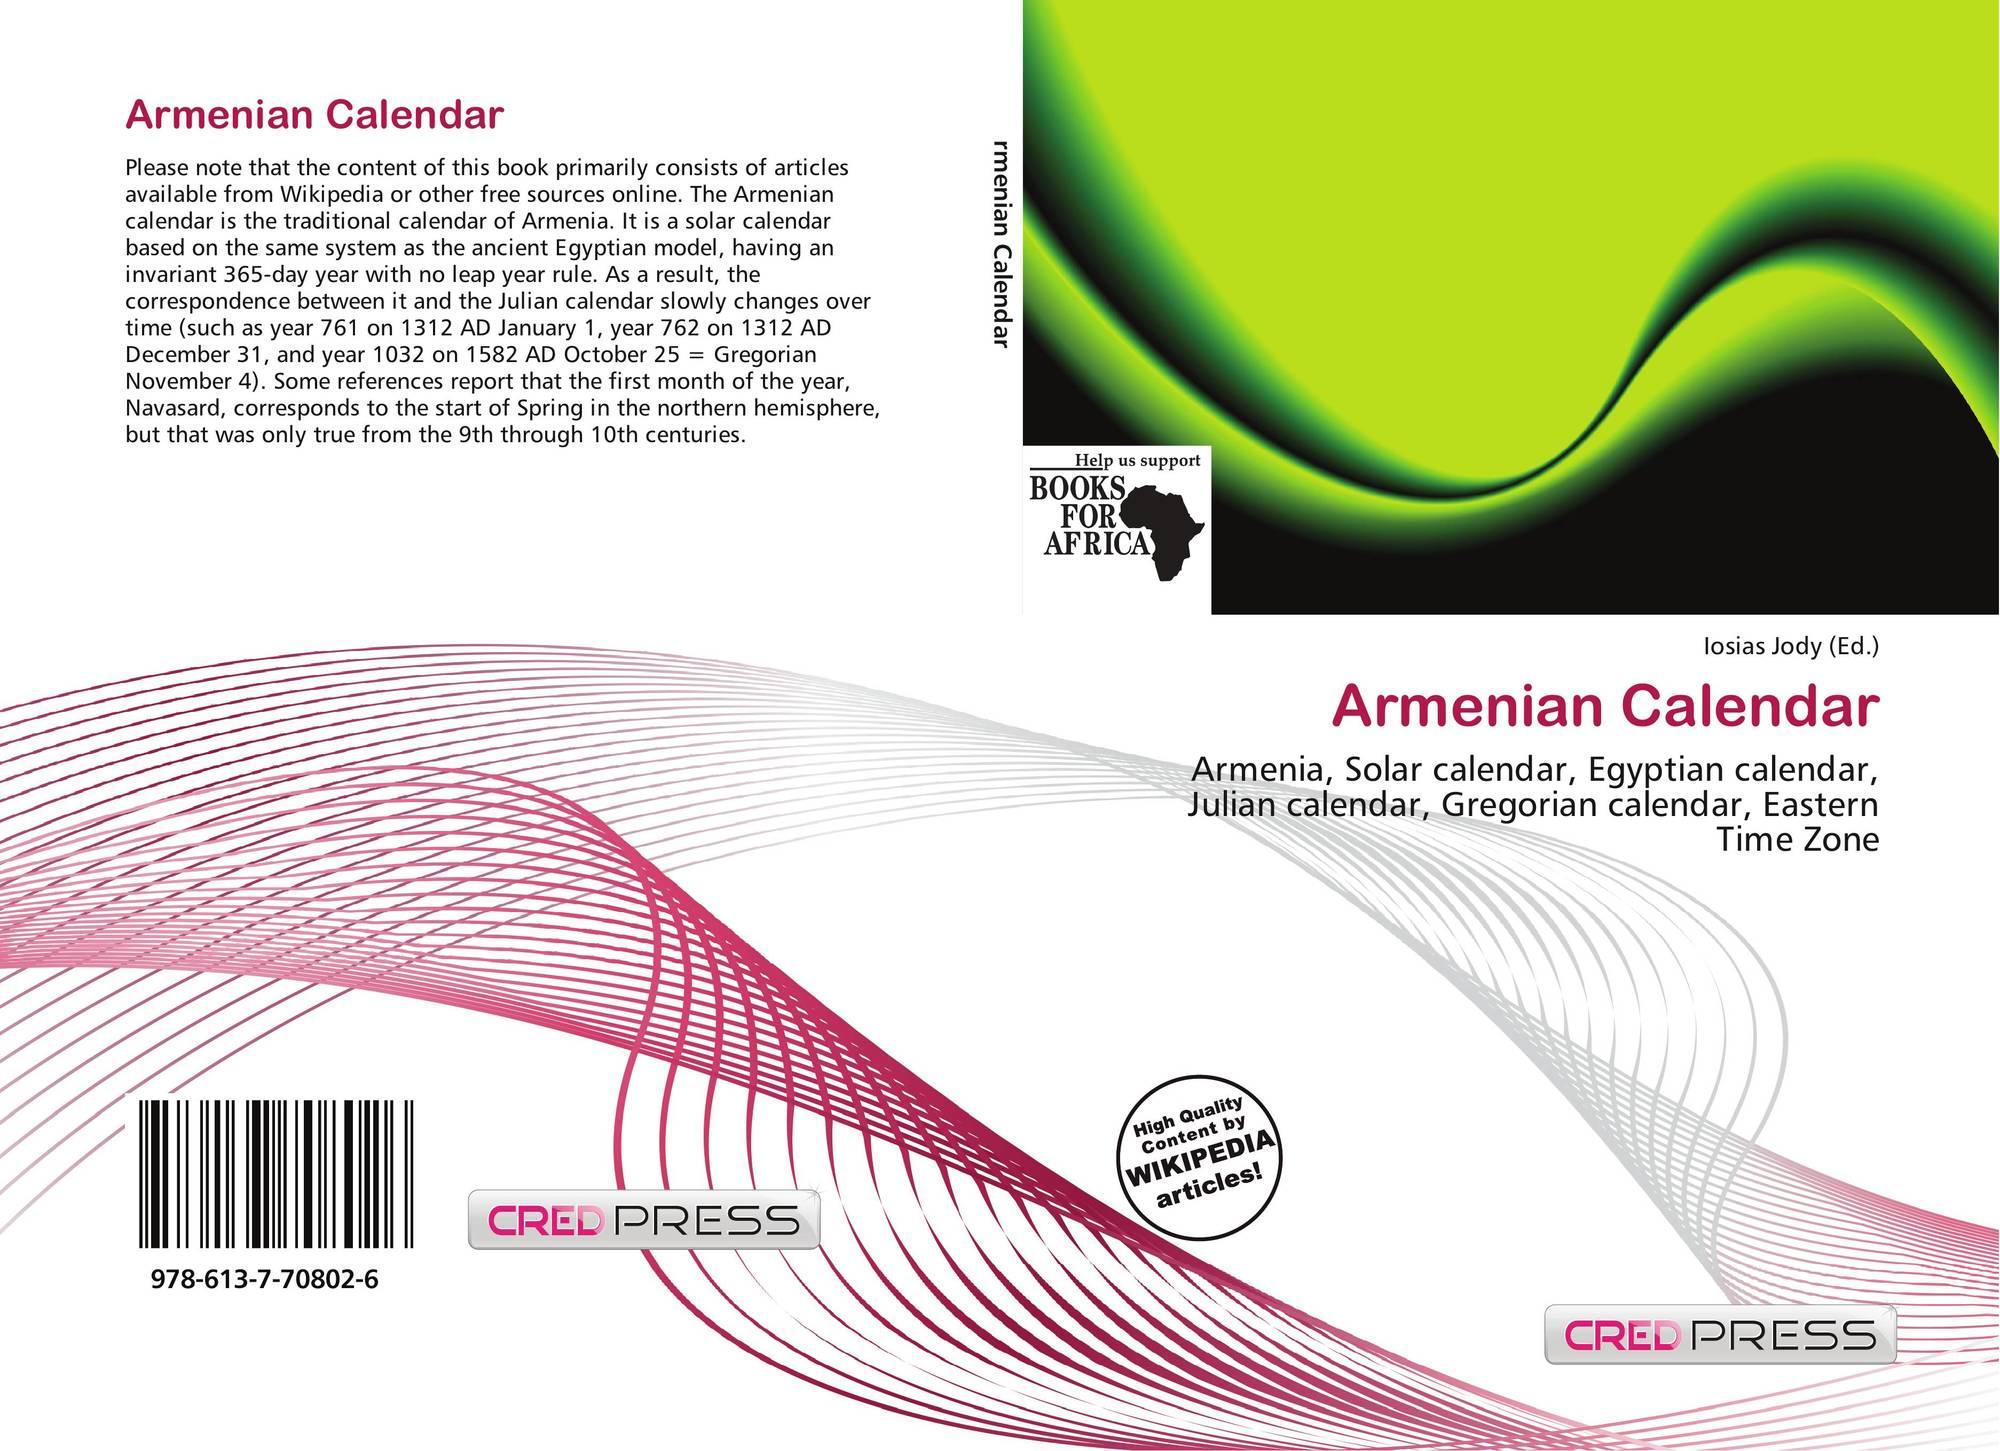 Armenian Calendar, 978-613-7-70802-6, 6137708020 ,9786137708026